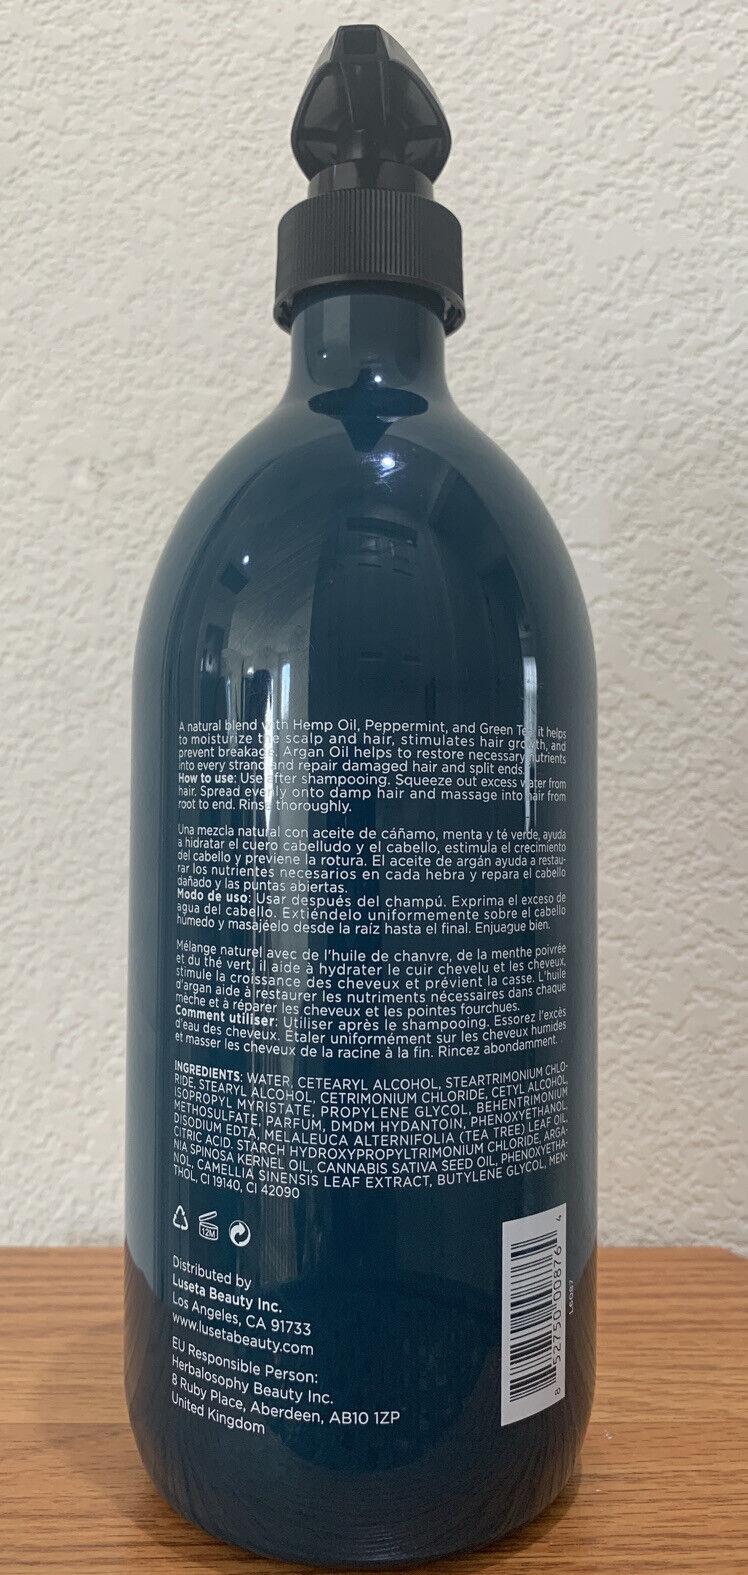 Luseta HEMP OIL COMPLEX Nourishing Conditioner w/ Hemp Oil, 33.8 fl oz New 1